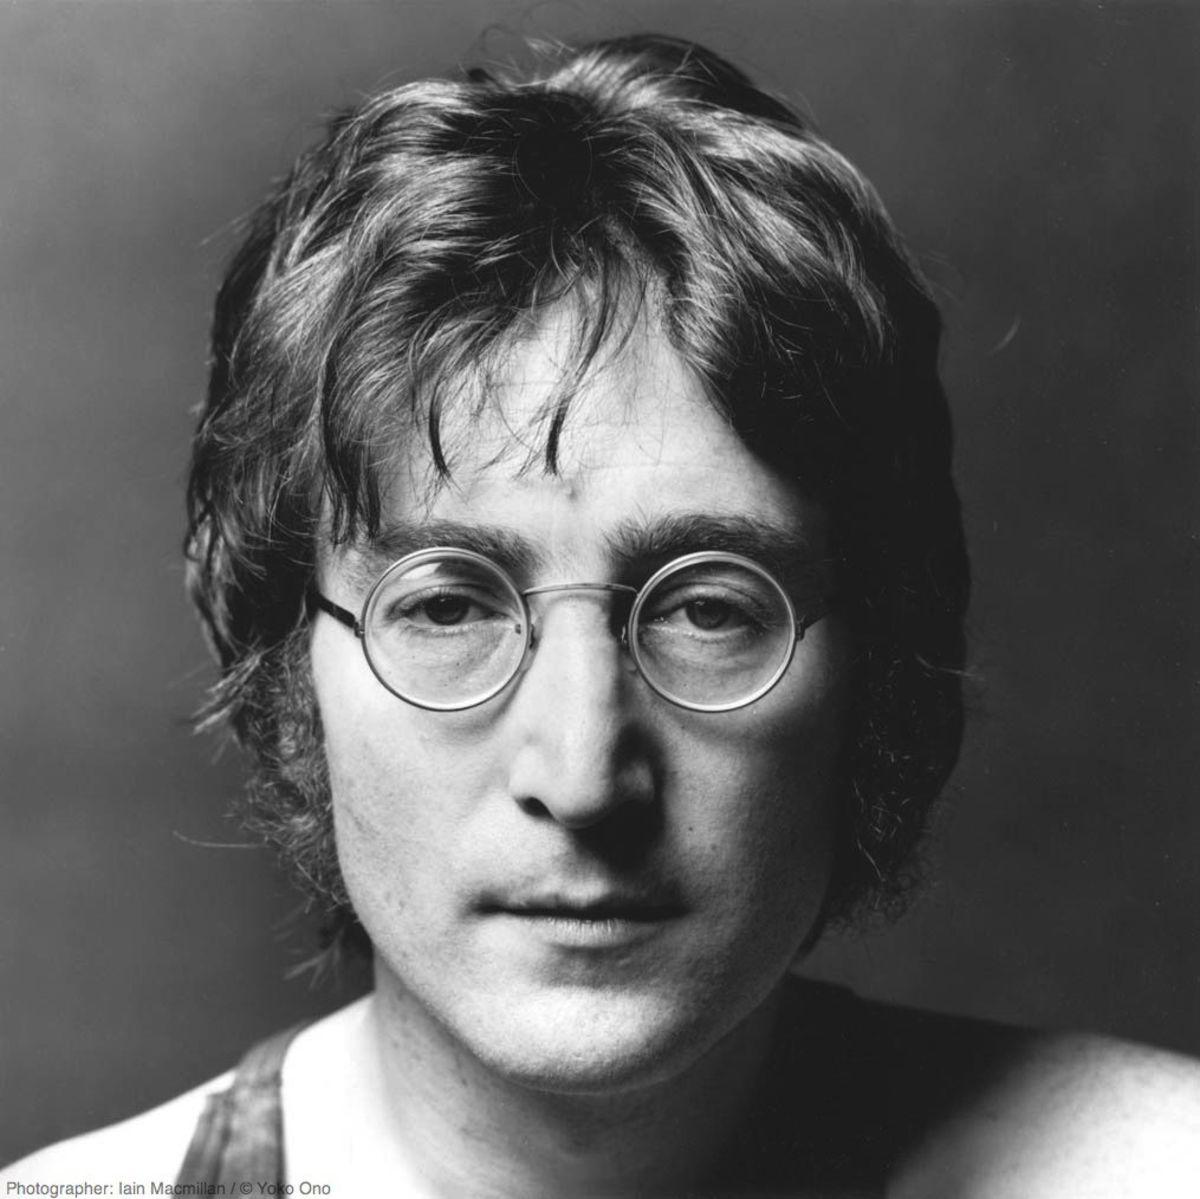 Why Did David Chapman Kill John Lennon?